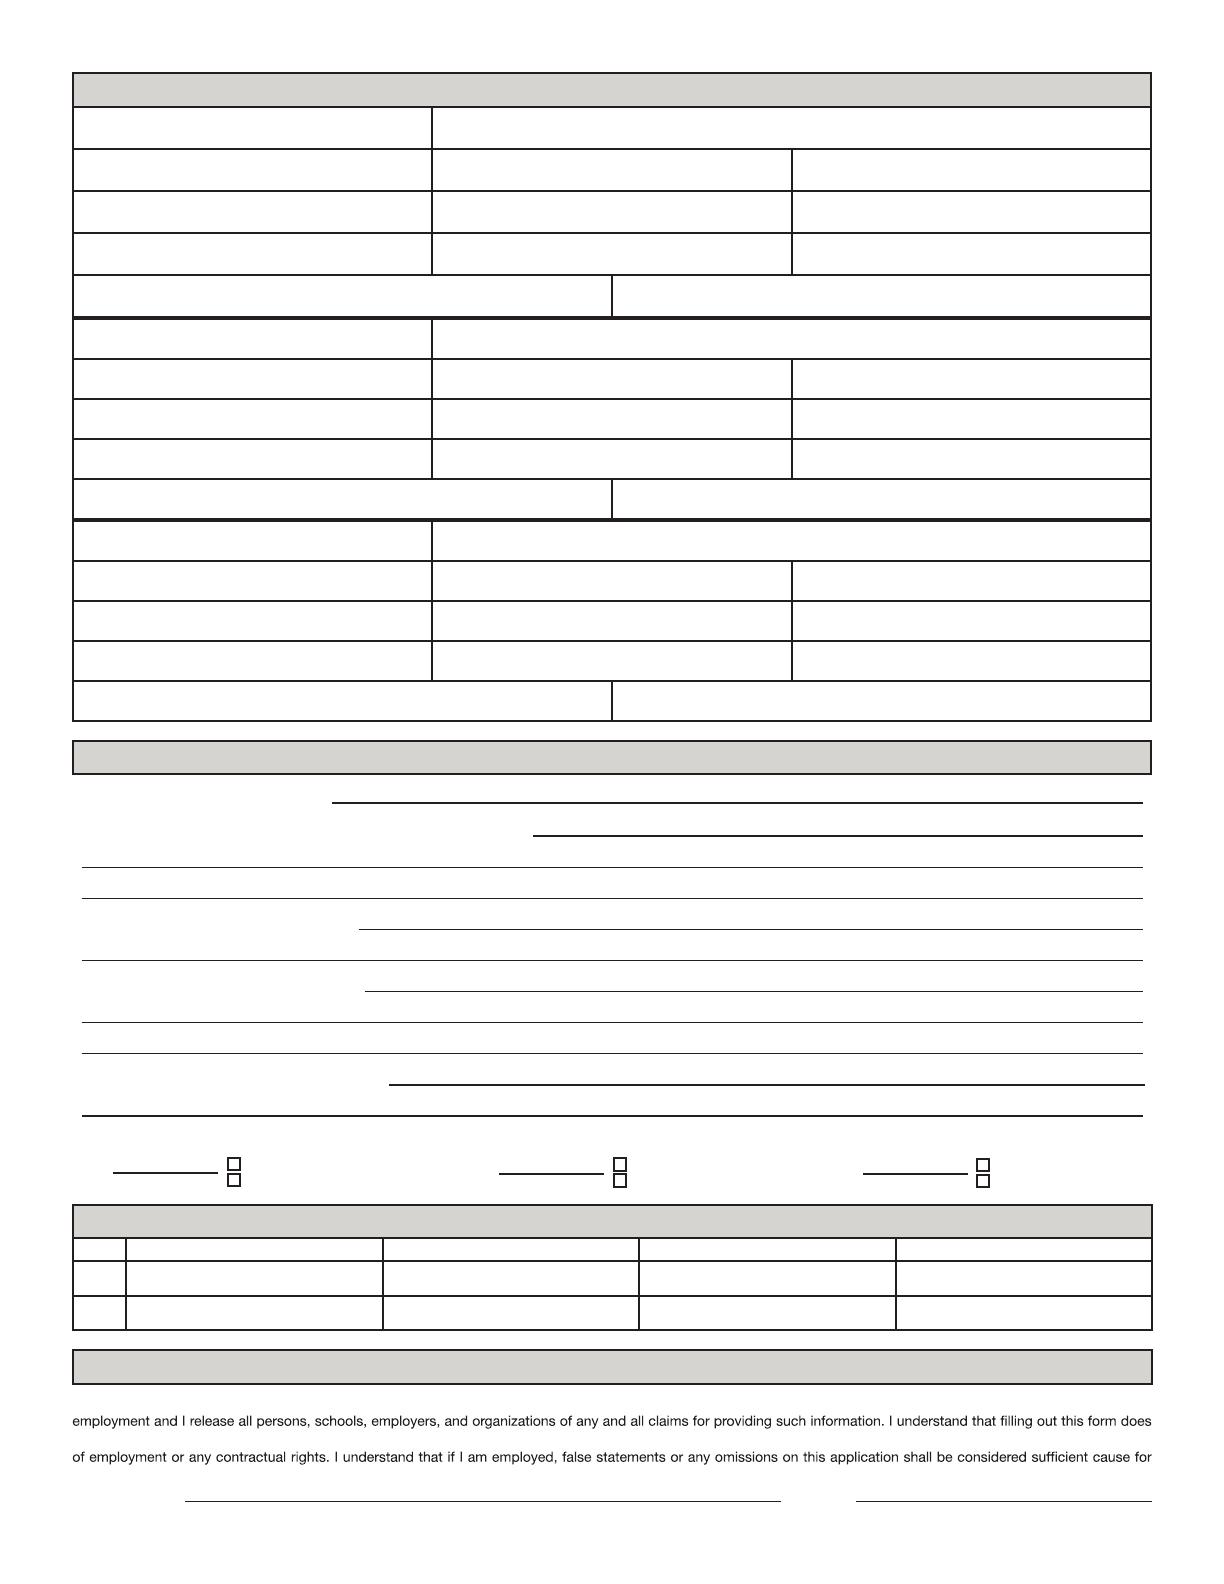 Free Printable Hot Topic Job Application Form Page 2